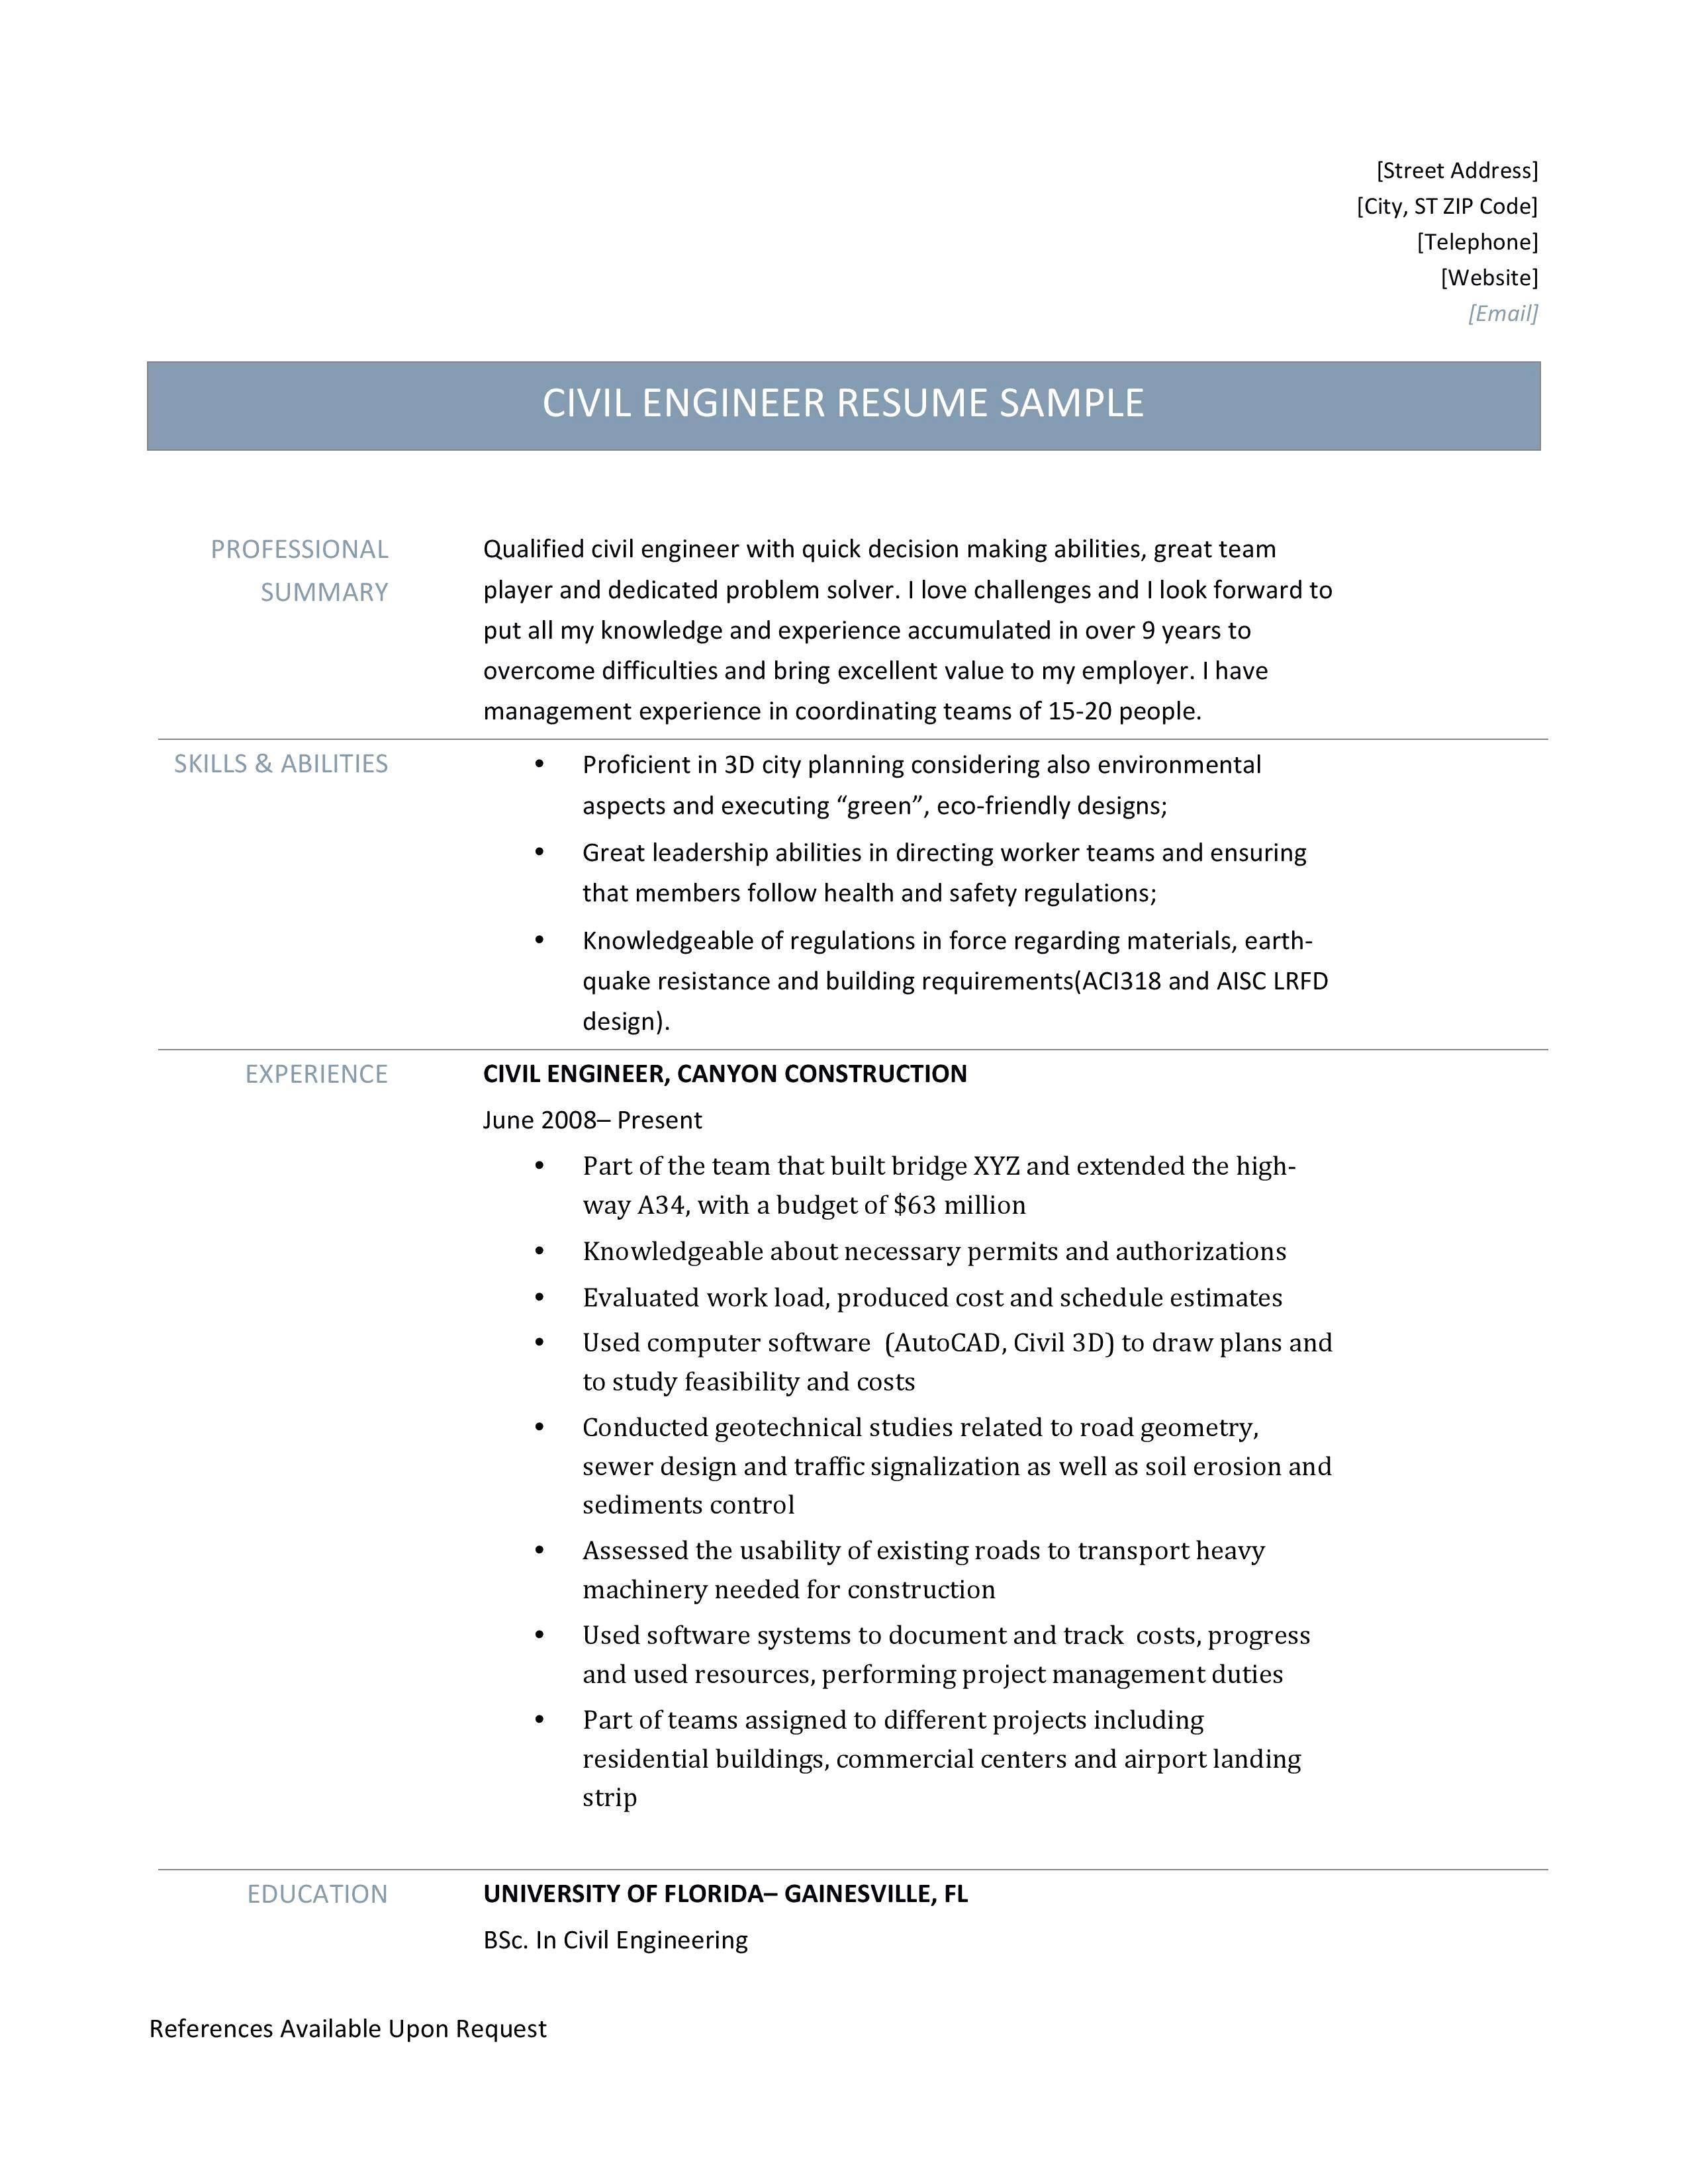 Diploma In Civil Engineering Resume Sample Sample Of Civil Engineer Resume Luxury Diploma In Civil